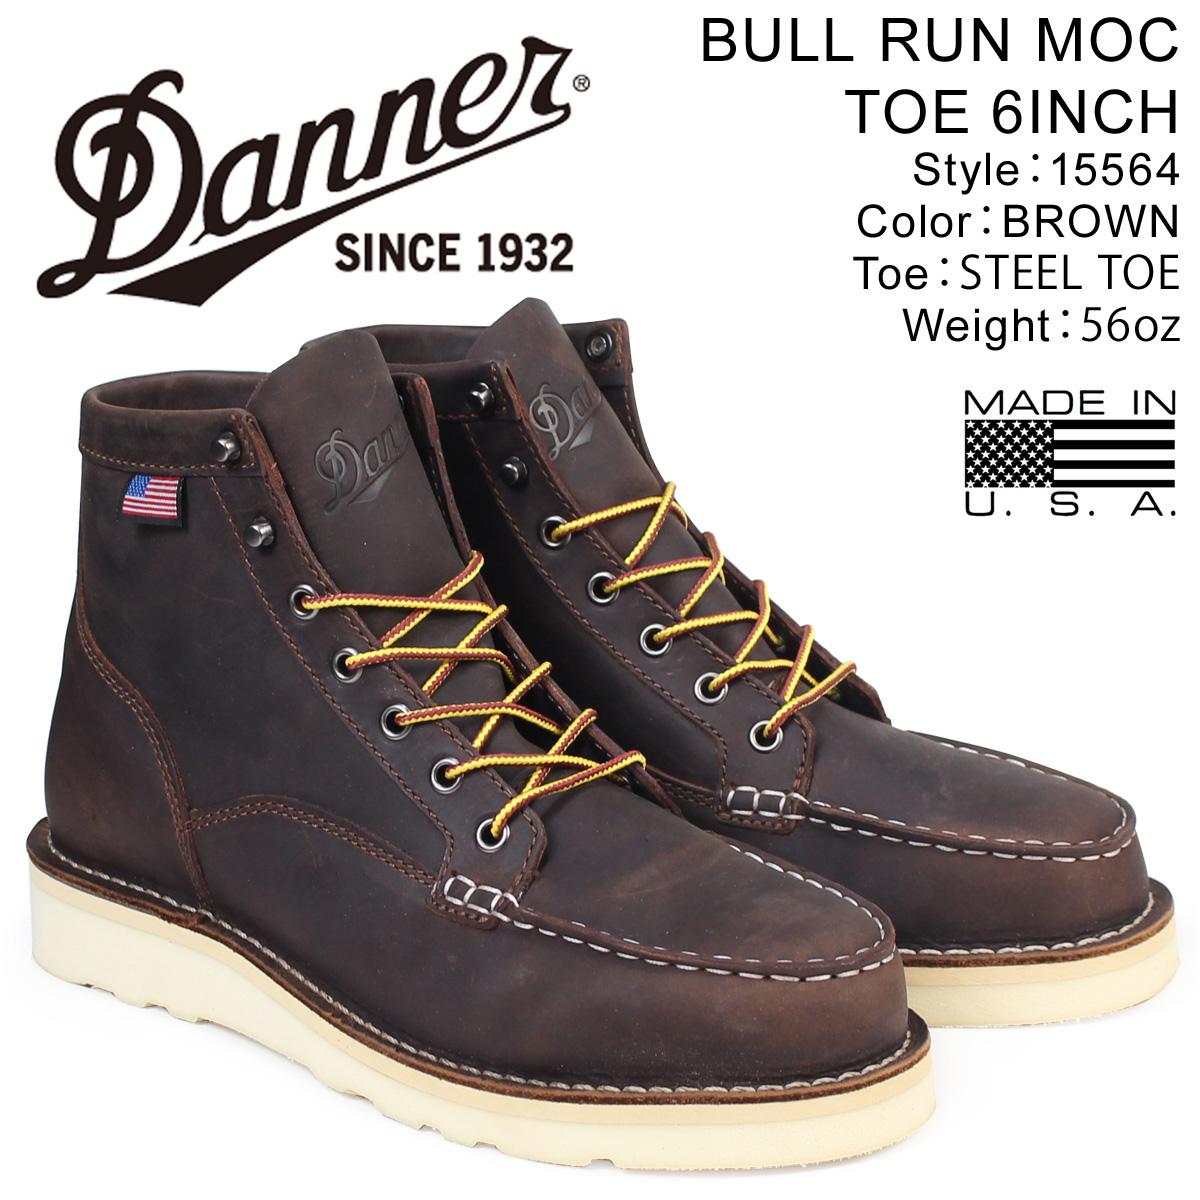 DANNER ブーツ ダナー BULL RUN MOC TOE 6INCH 15564 Dワイズ メンズ ブラウン